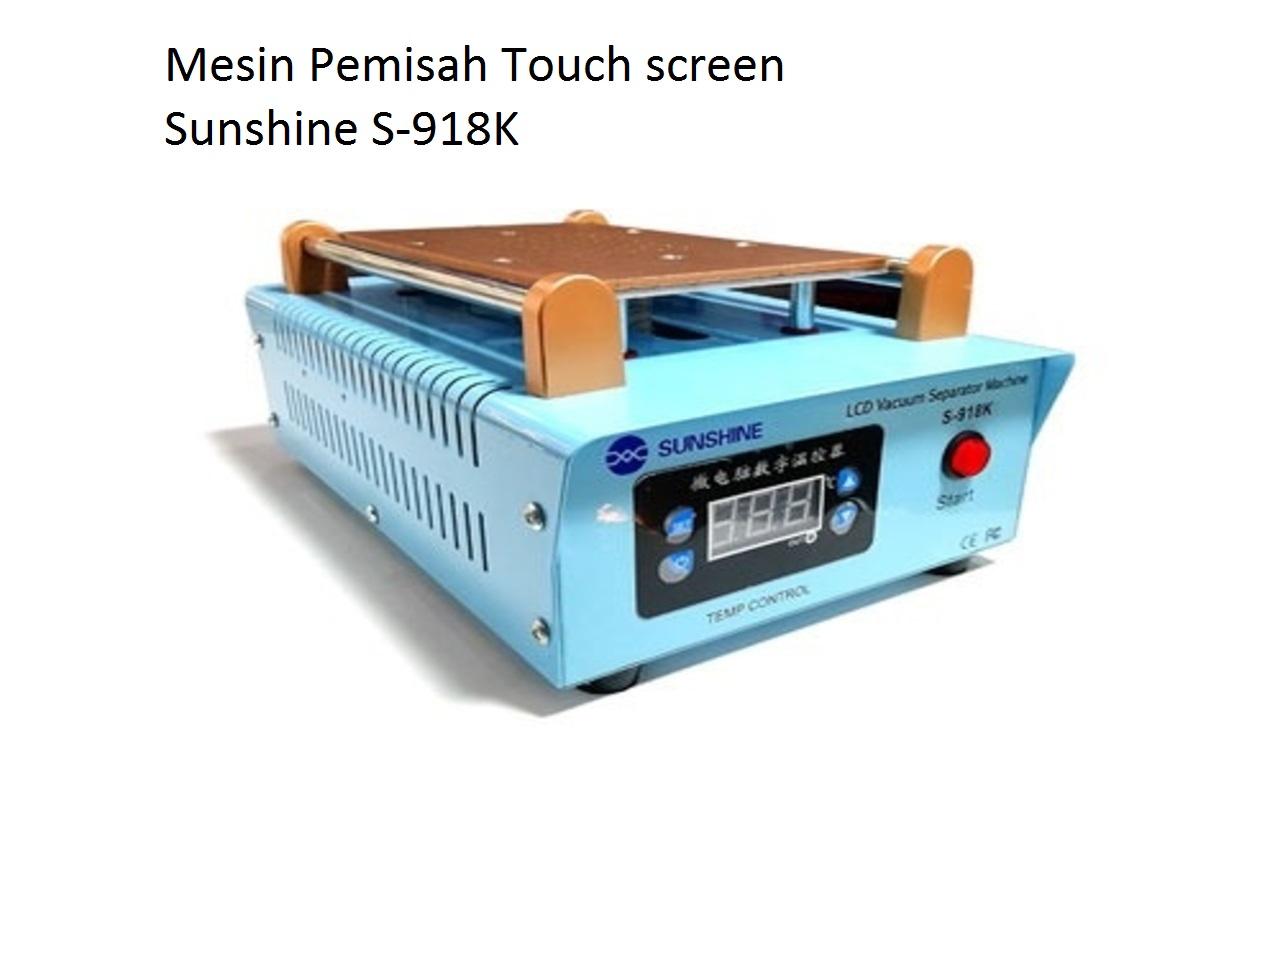 MESIN PEMISAH TOUCHSCREEN SUNSHINE S-918K